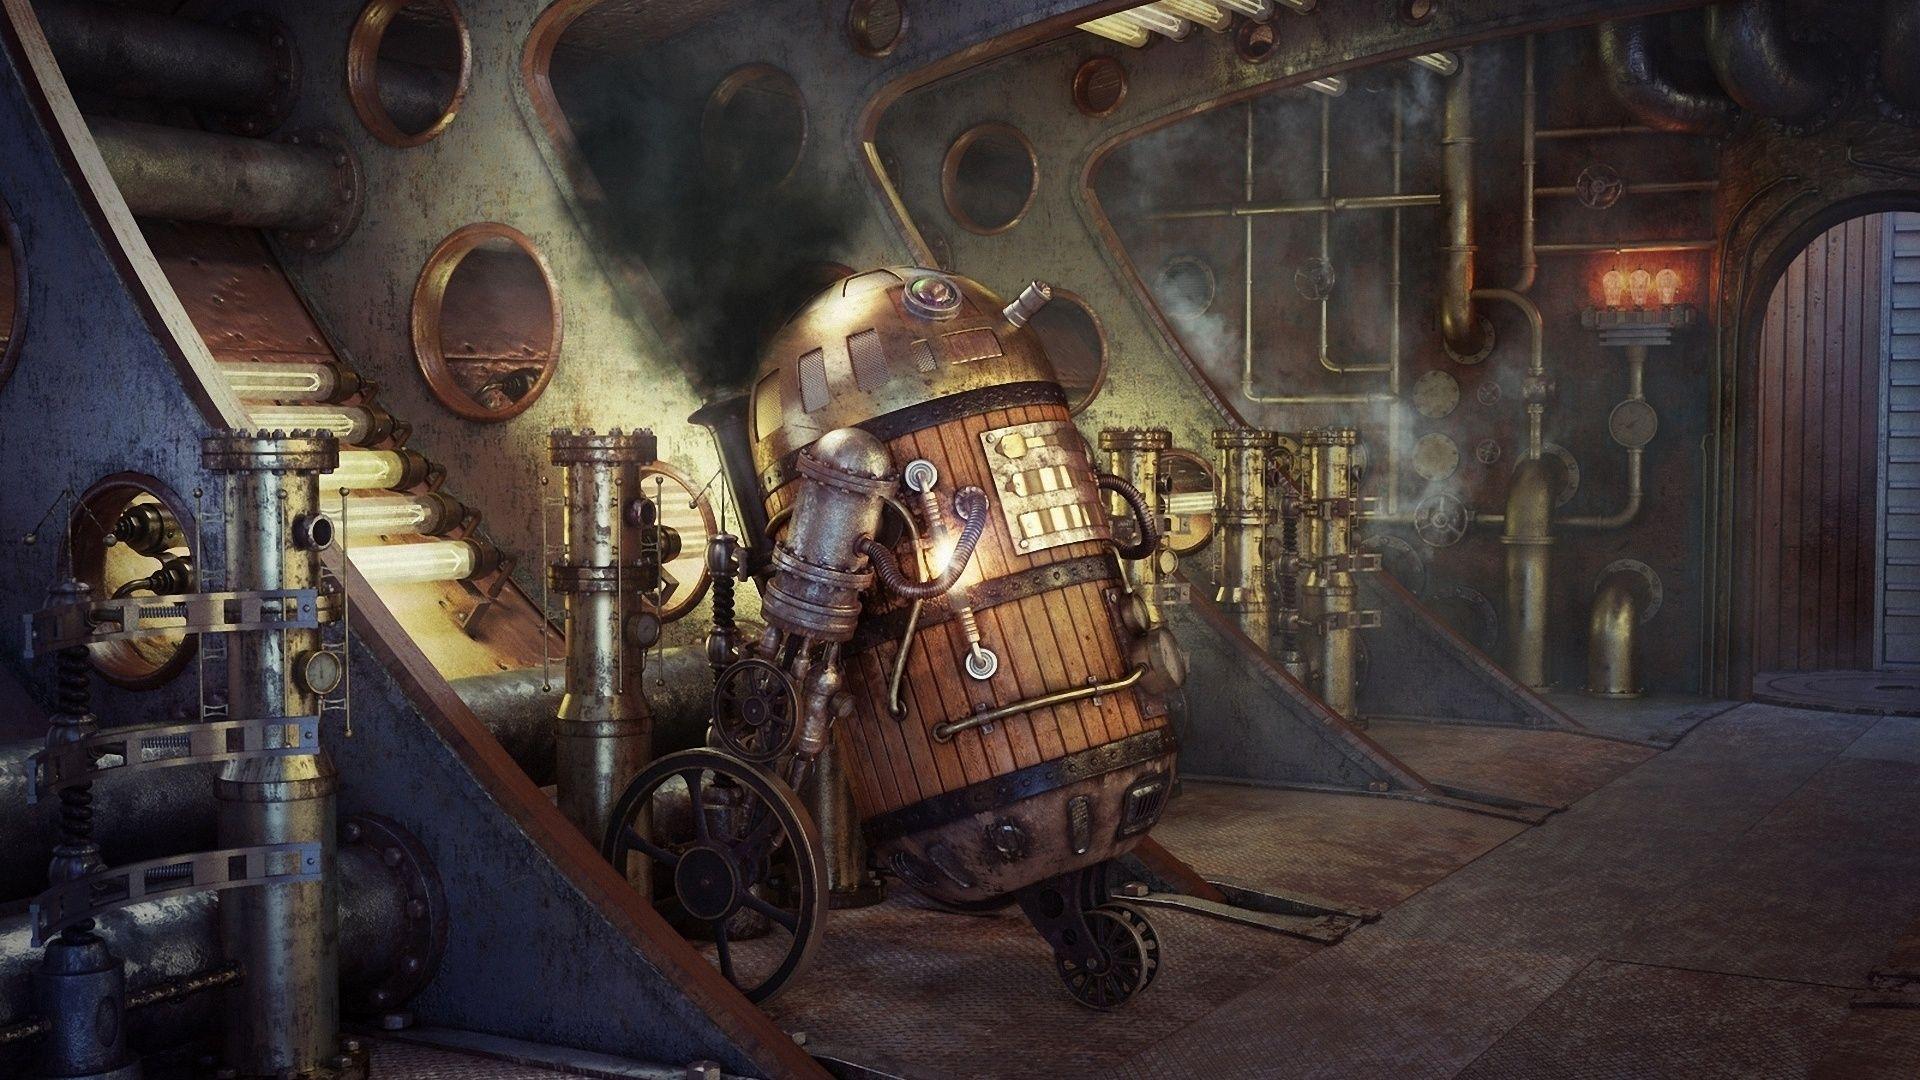 Rd, Star Wars, Art, Robot, Pipe, Steampunk , Smoke